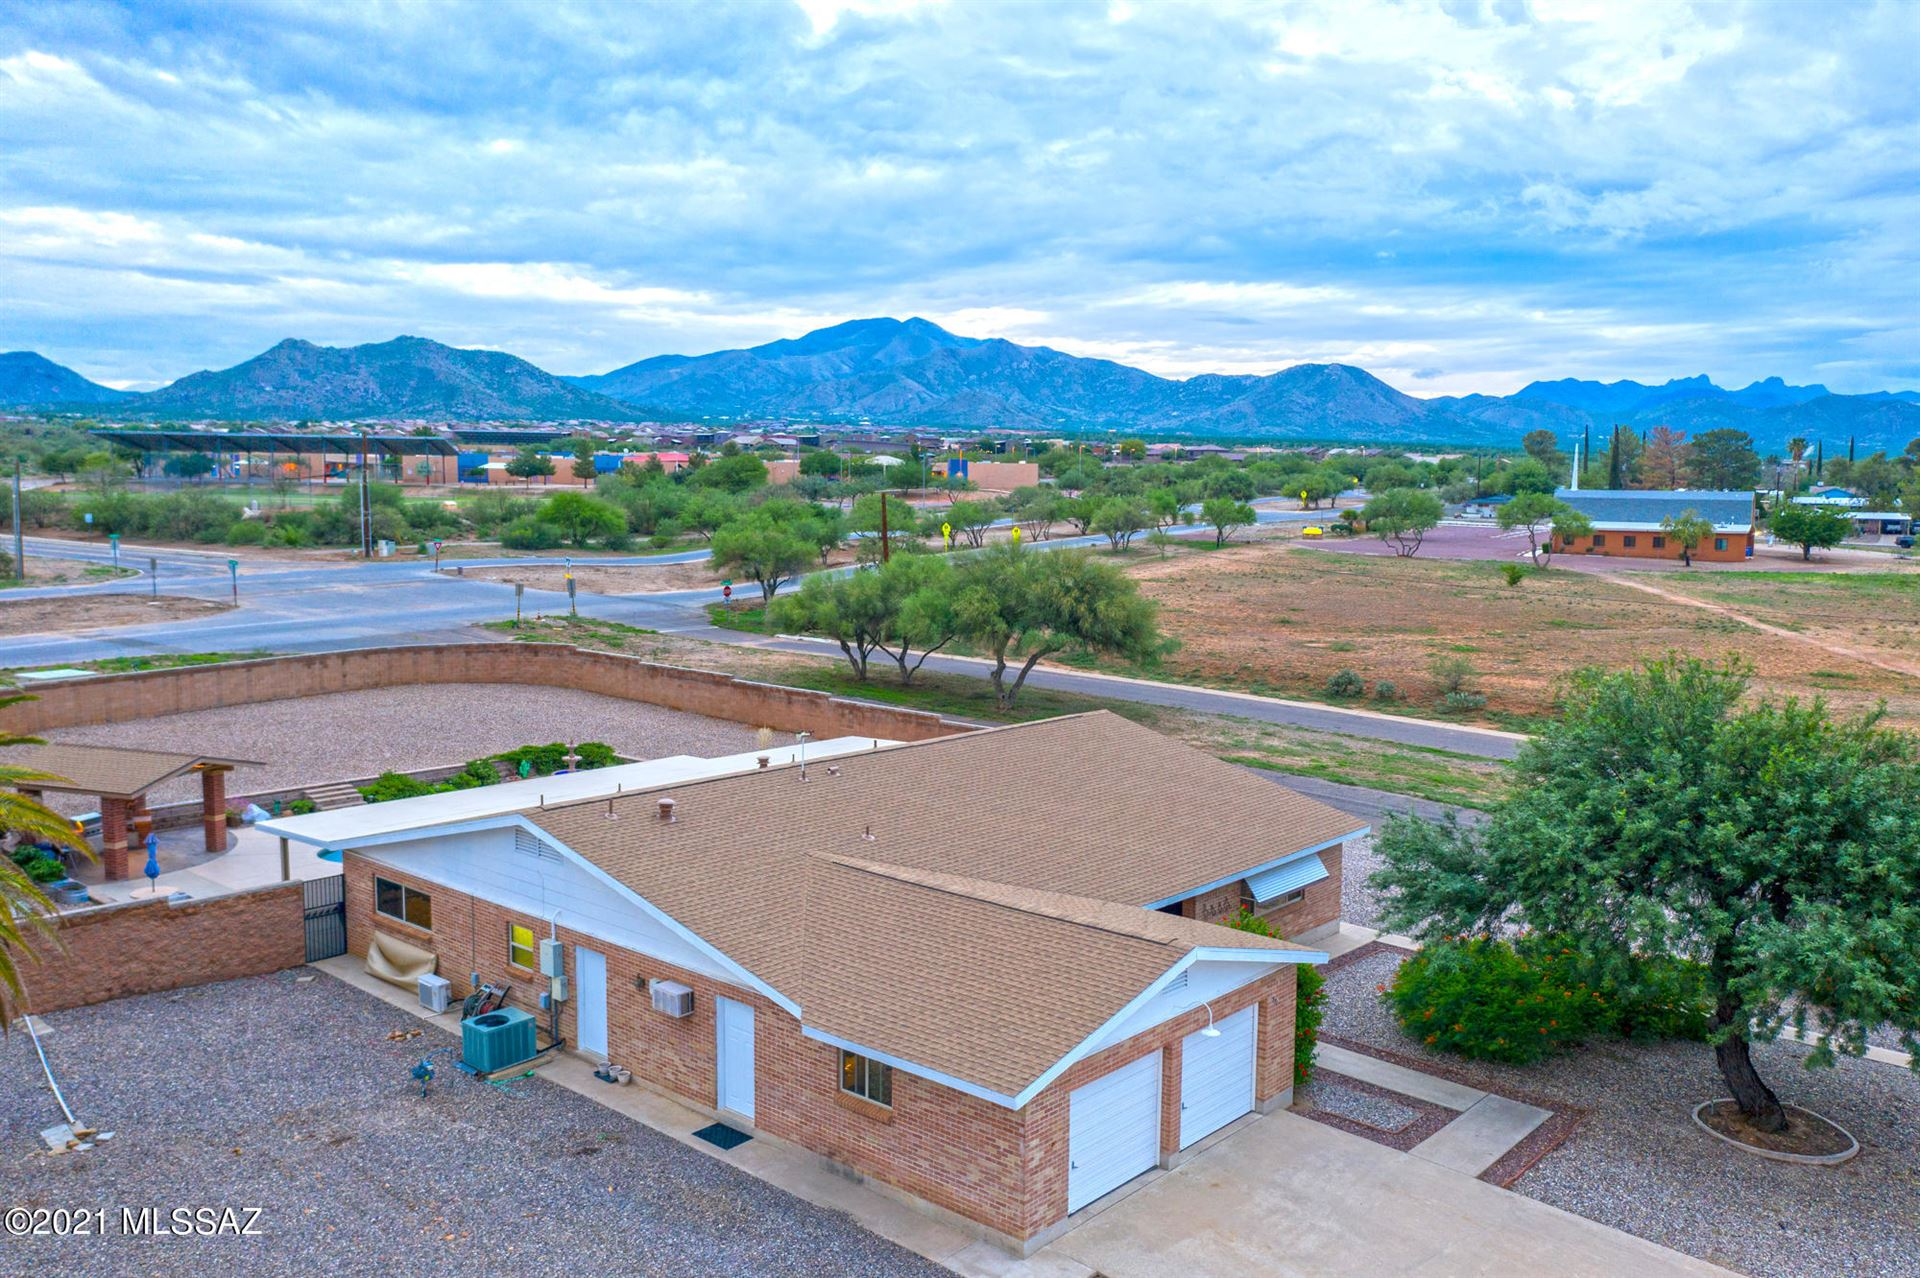 371 S Holcomb Place, Vail, AZ 85641 - MLS#: 22119595